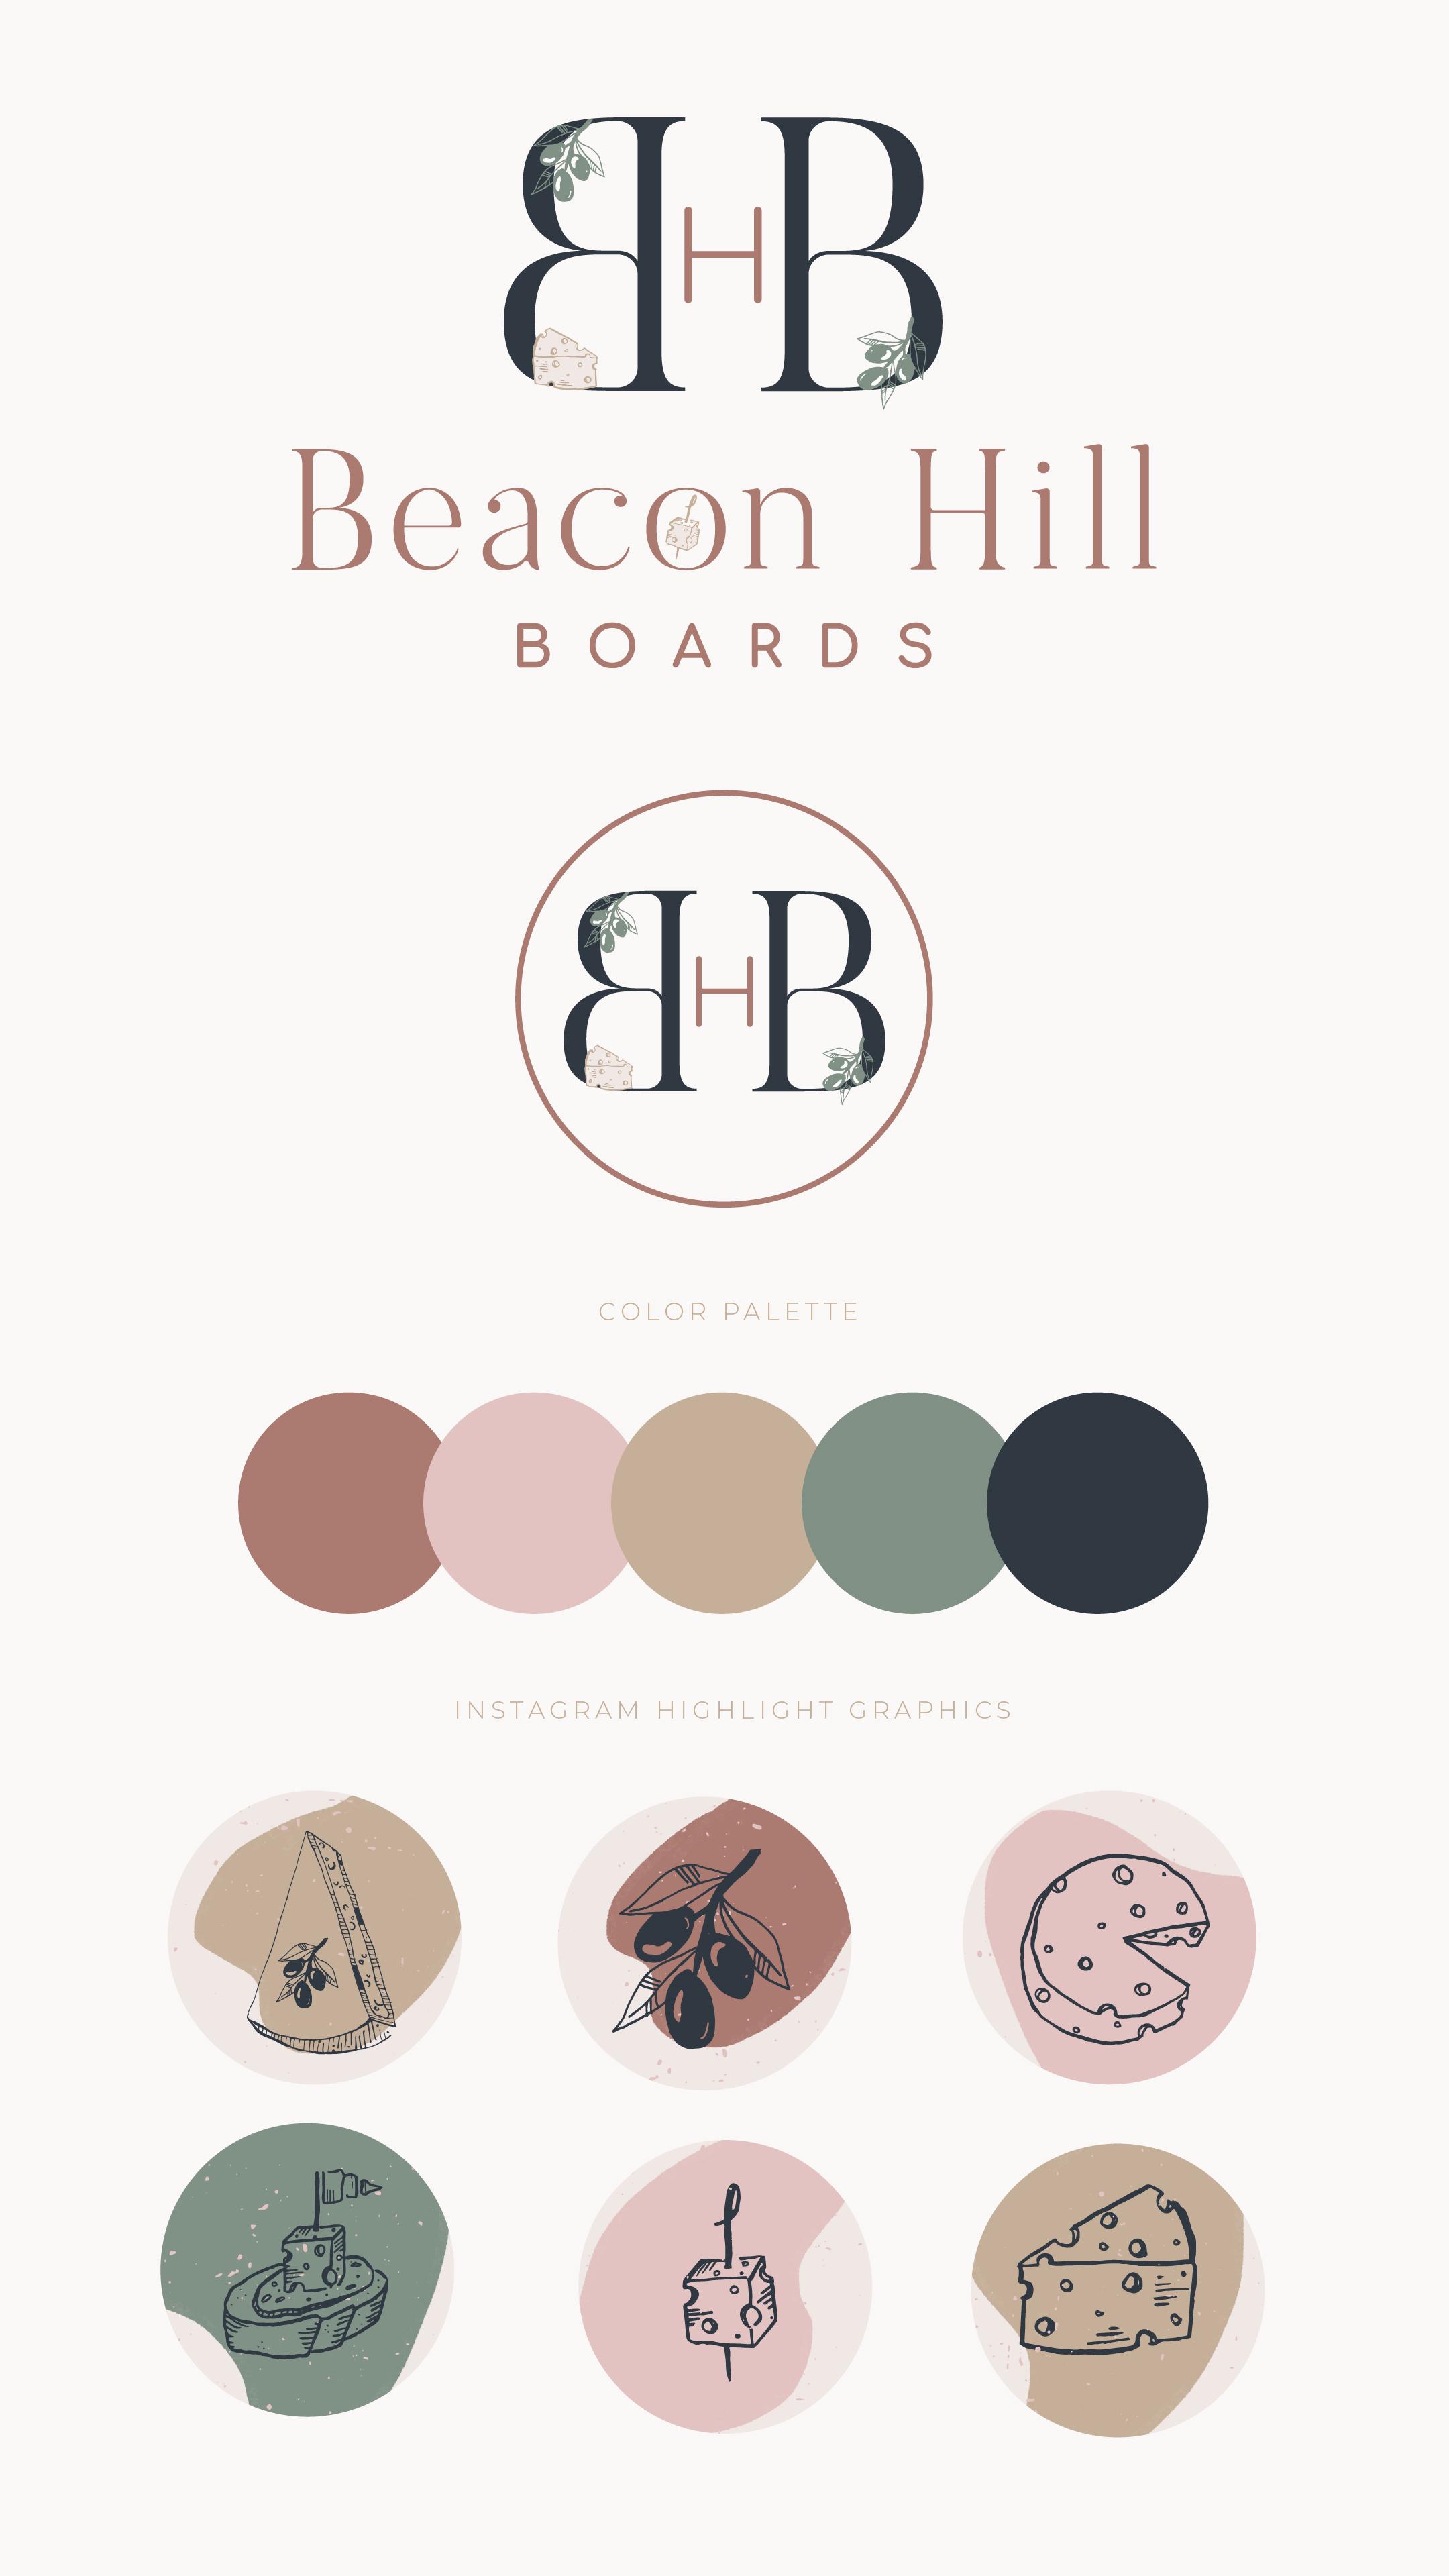 Beacon Hill Boards Branding